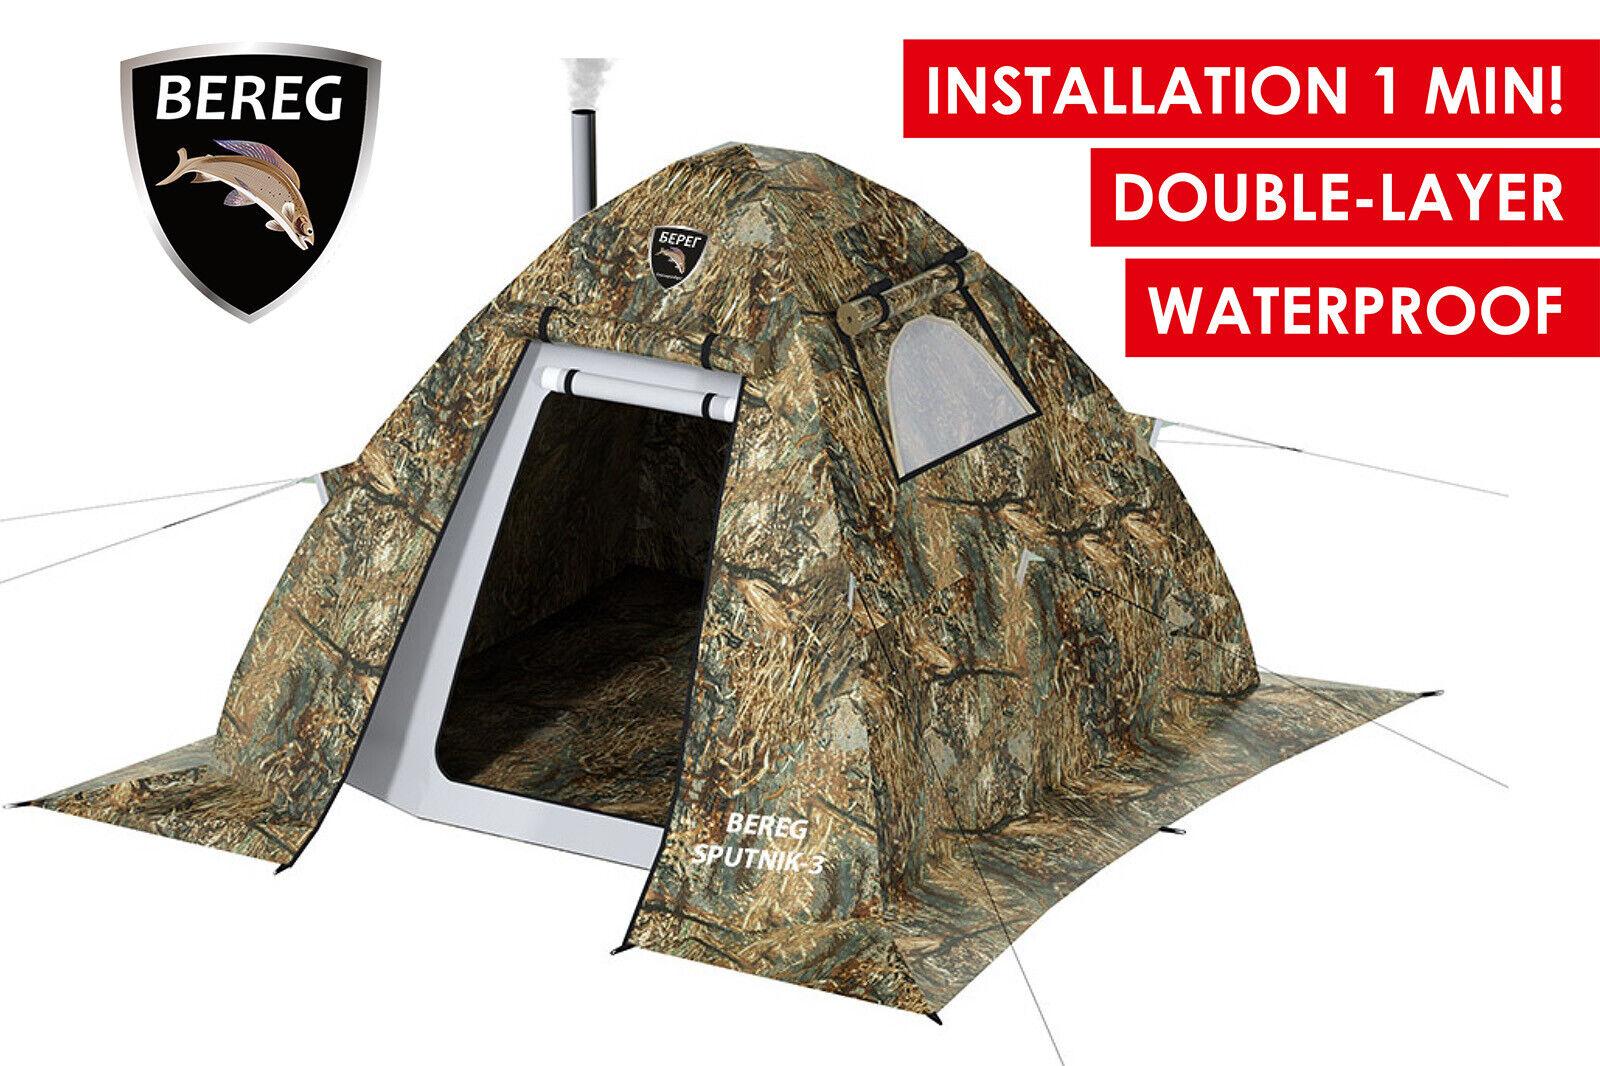 Universal tuttiseason doppiolayer Waterproof Tent Bereg Sputnik3